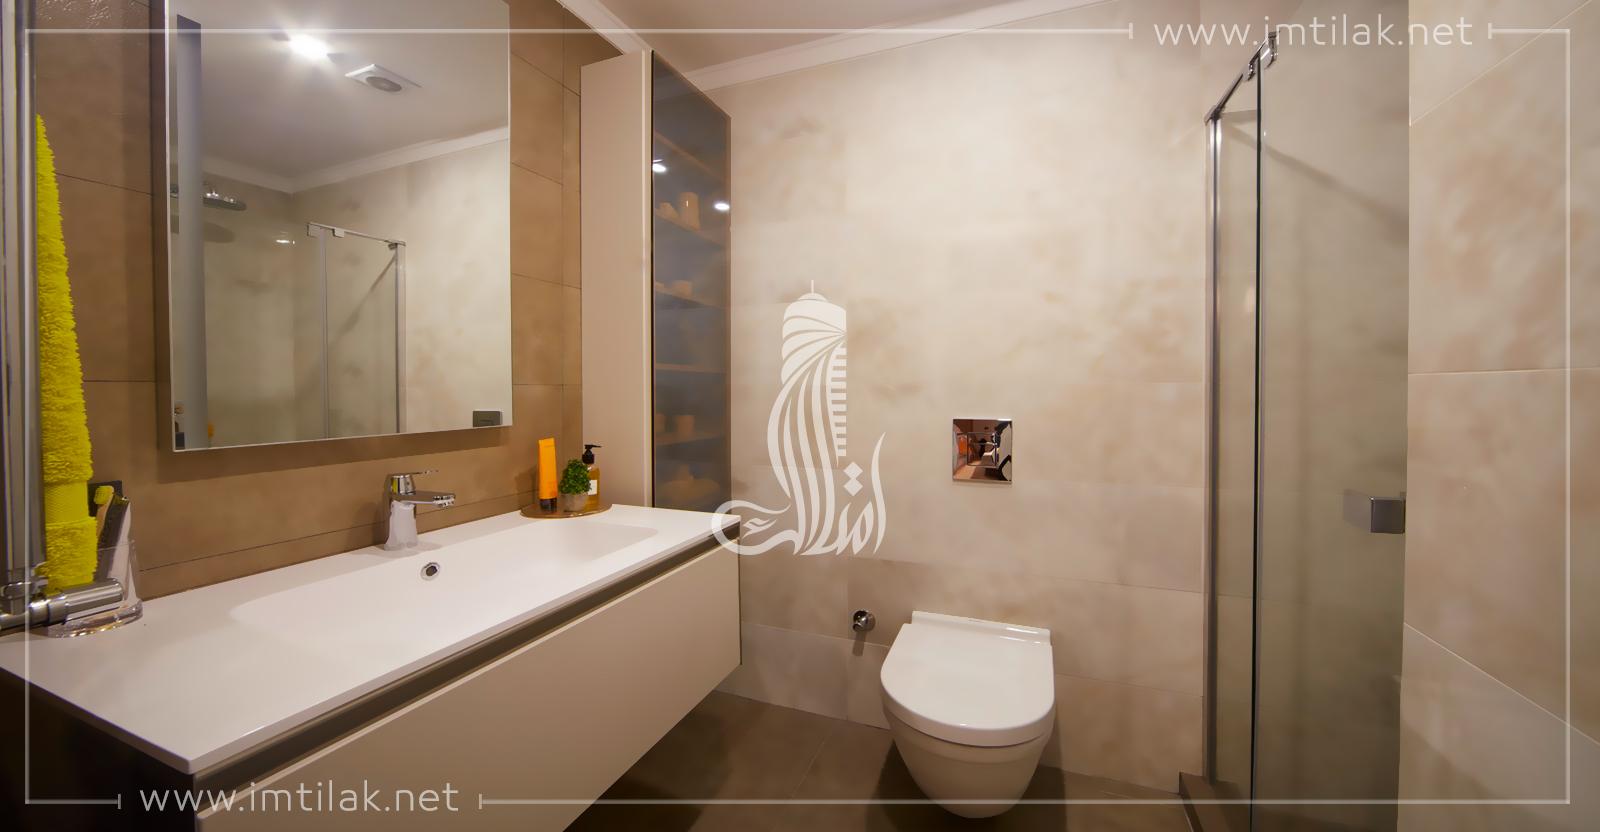 IMT-145 Seashell Marmara project